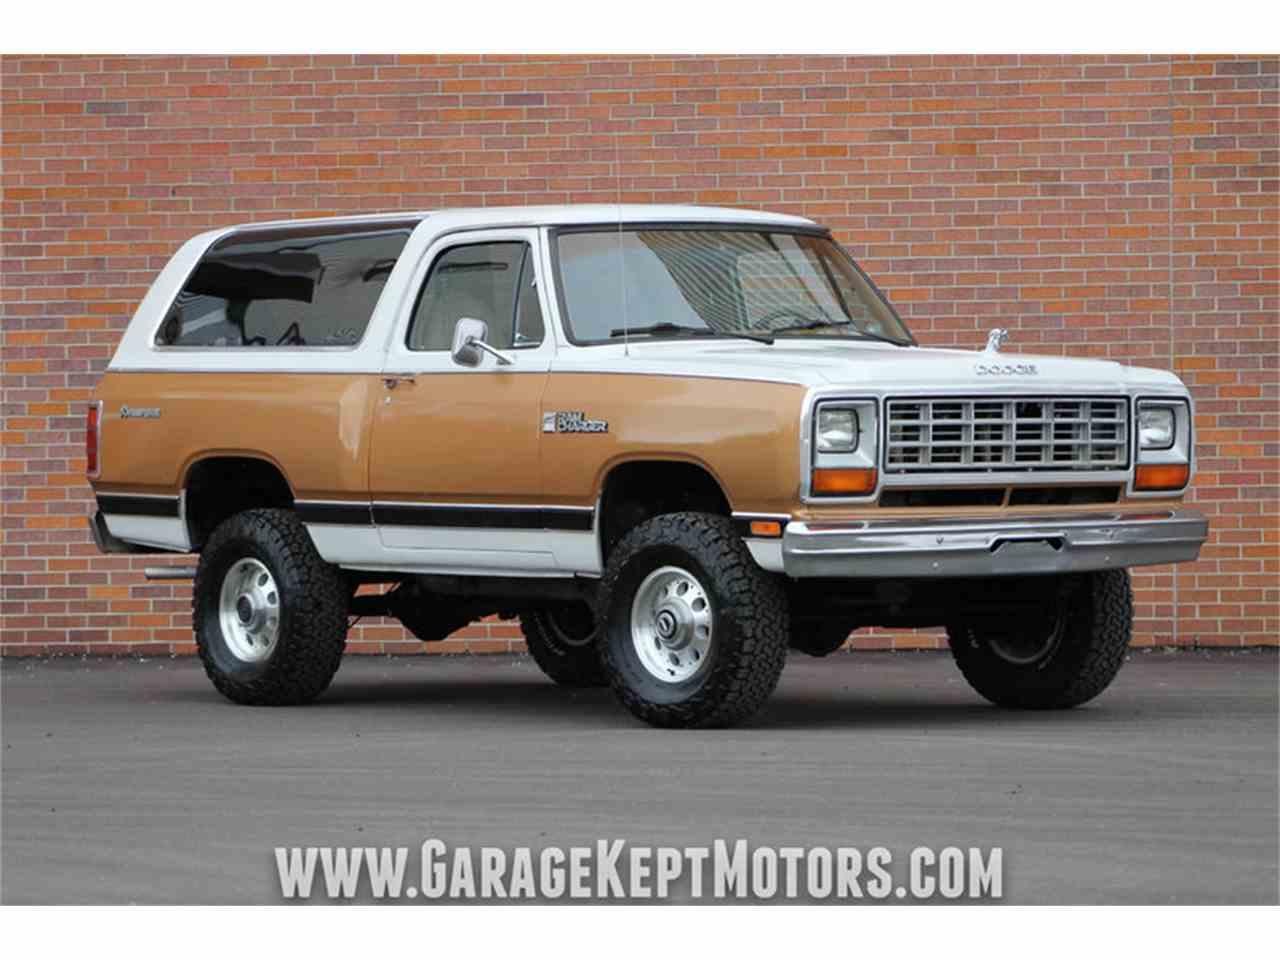 1985 Dodge Ramcharger Prospector 4x4 for Sale ...